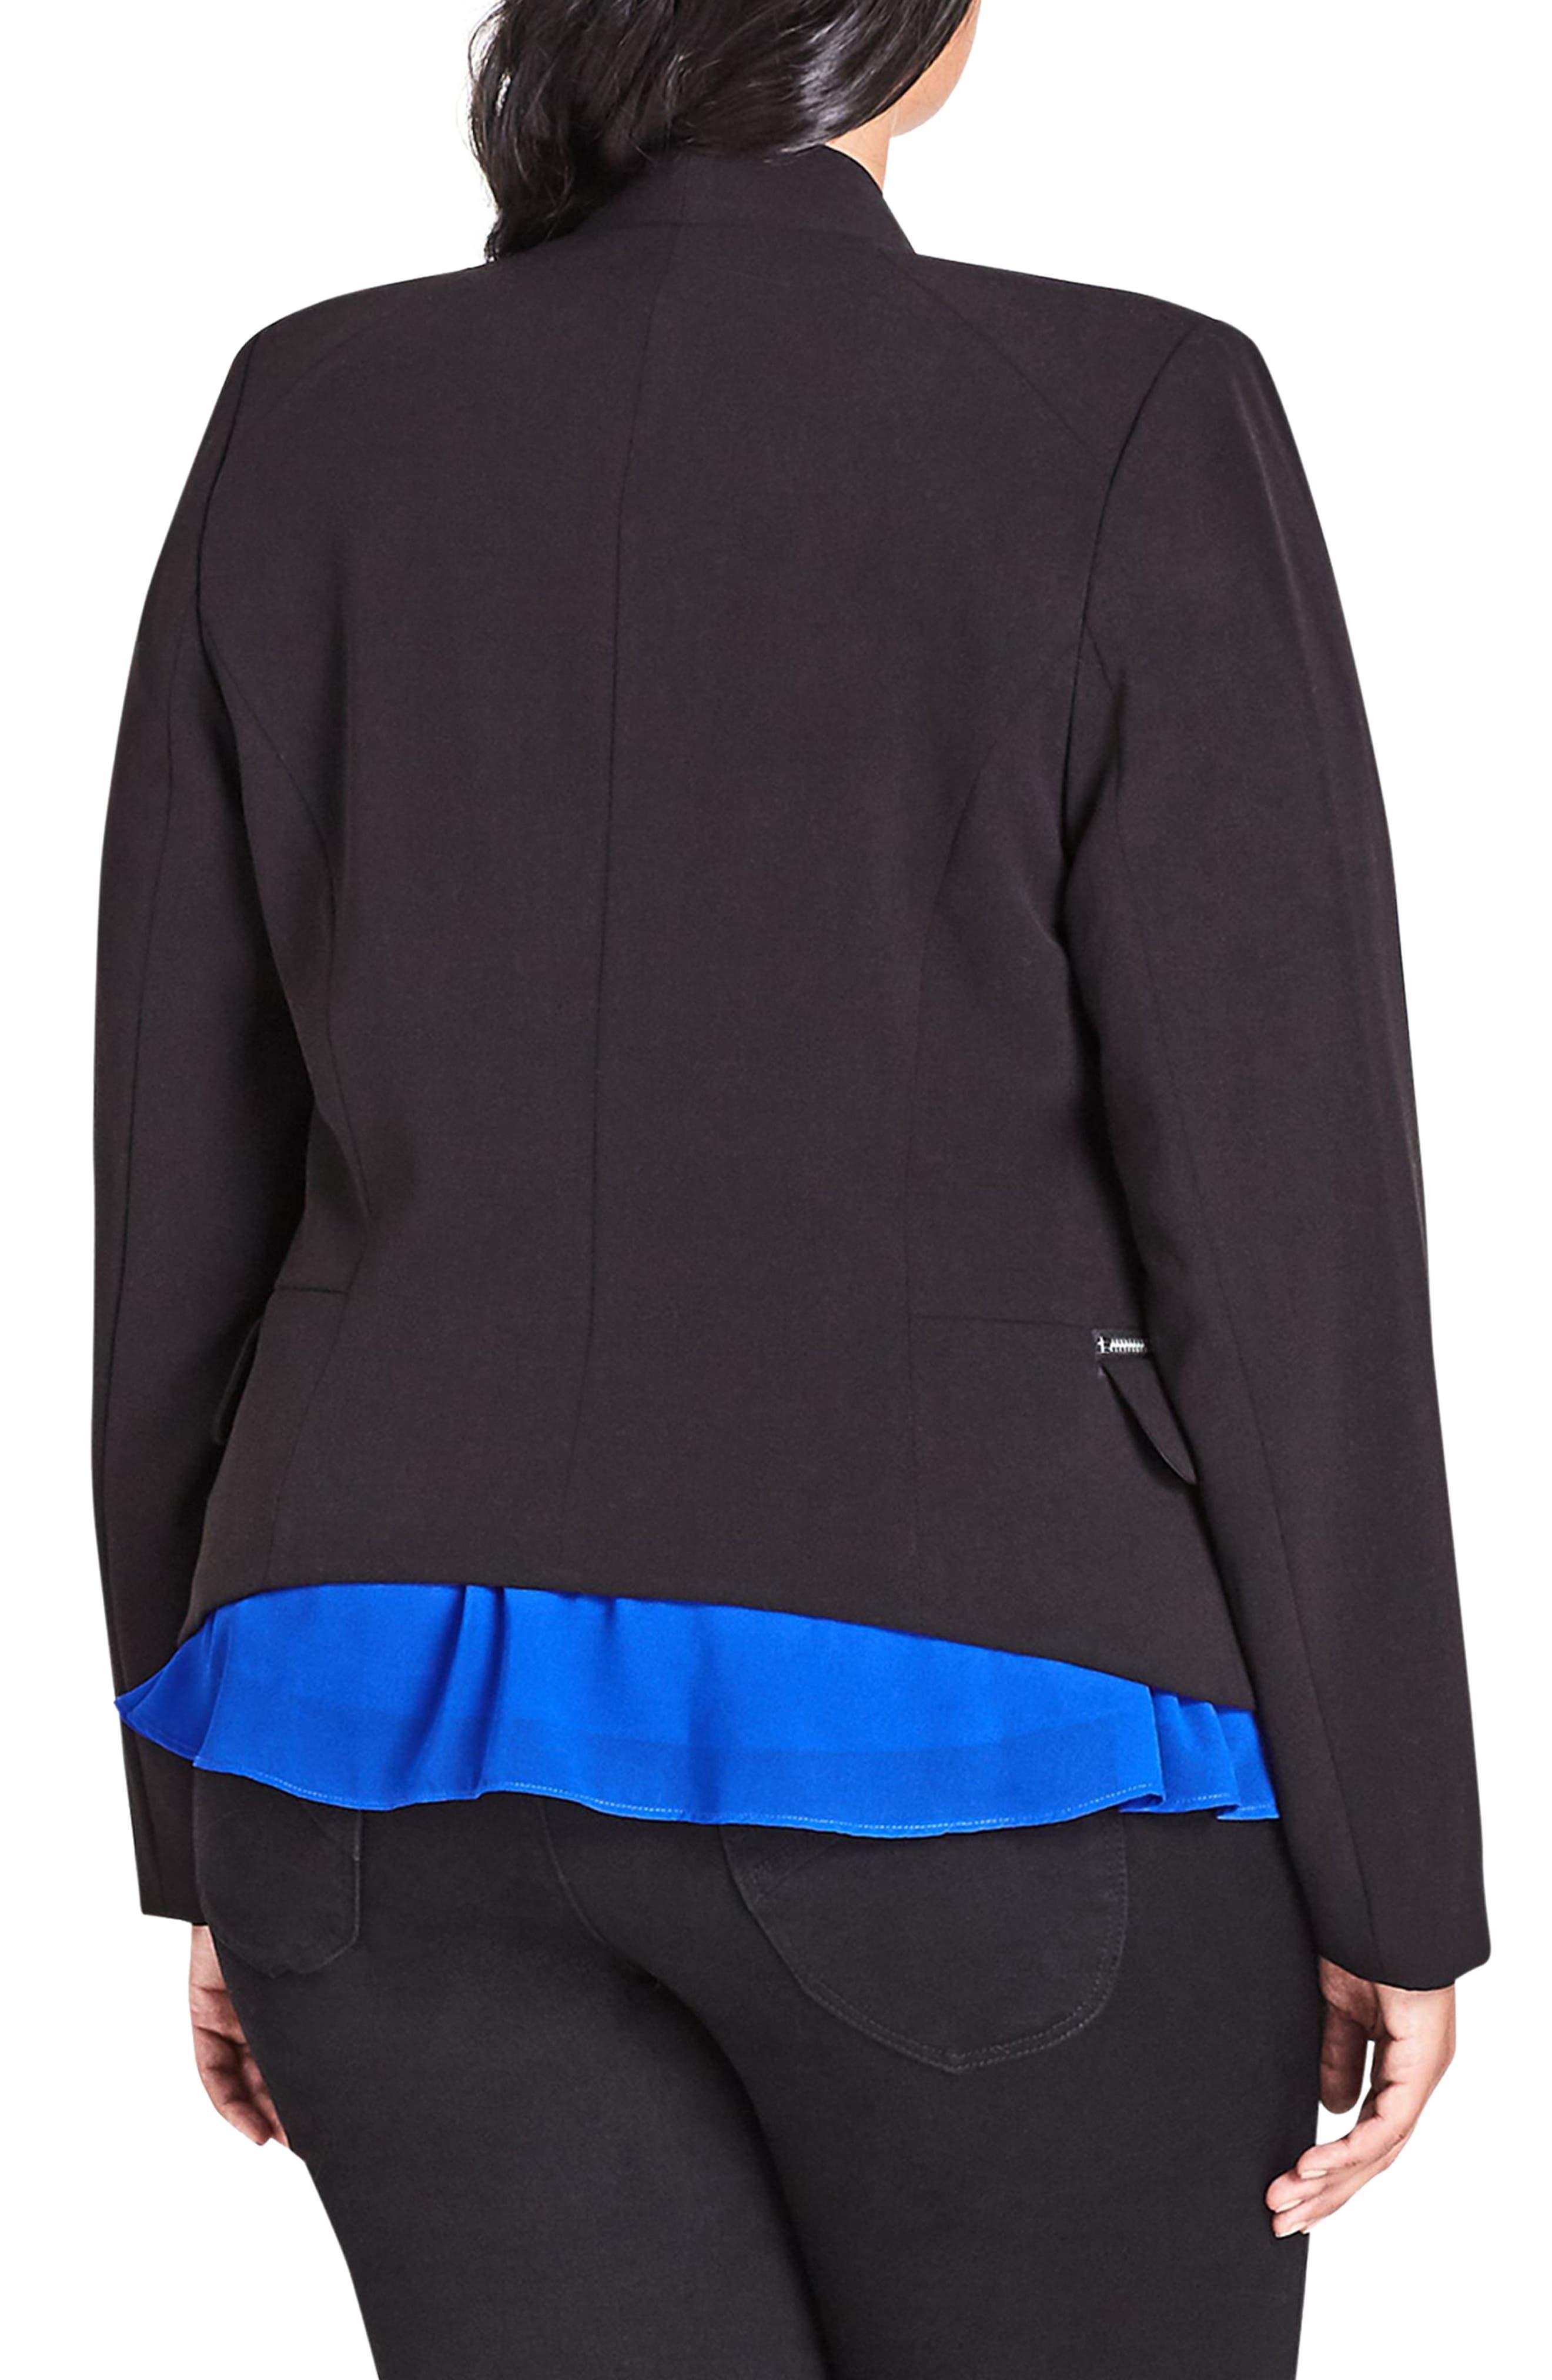 Elegance Fitted Jacket,                             Alternate thumbnail 2, color,                             001